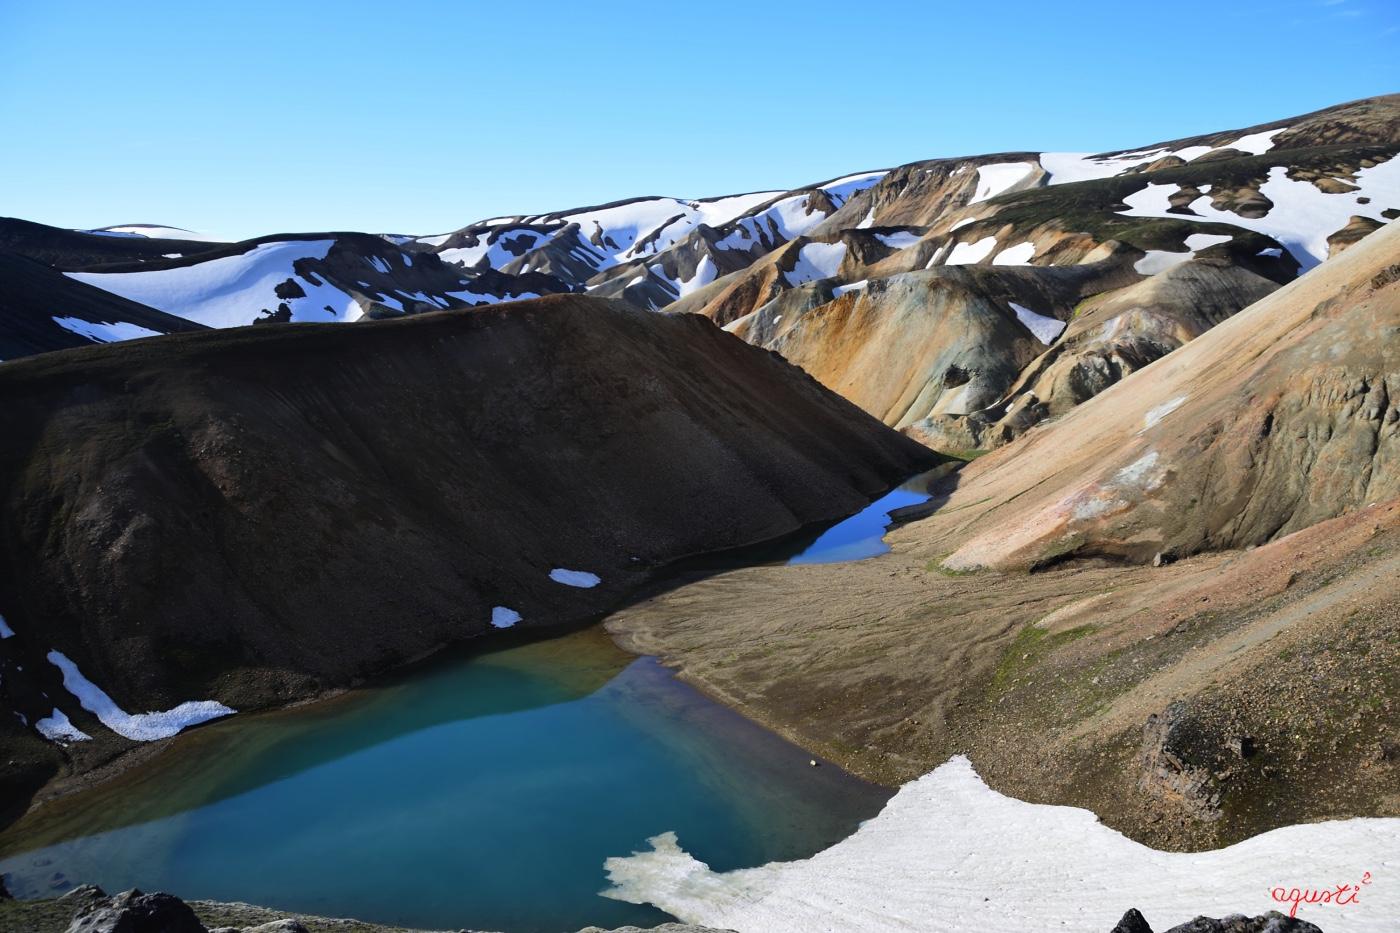 PAISATGES ISLANDIA - agusti lopez rodriguez i agusti meseguer altes, Fotografía entorn natural